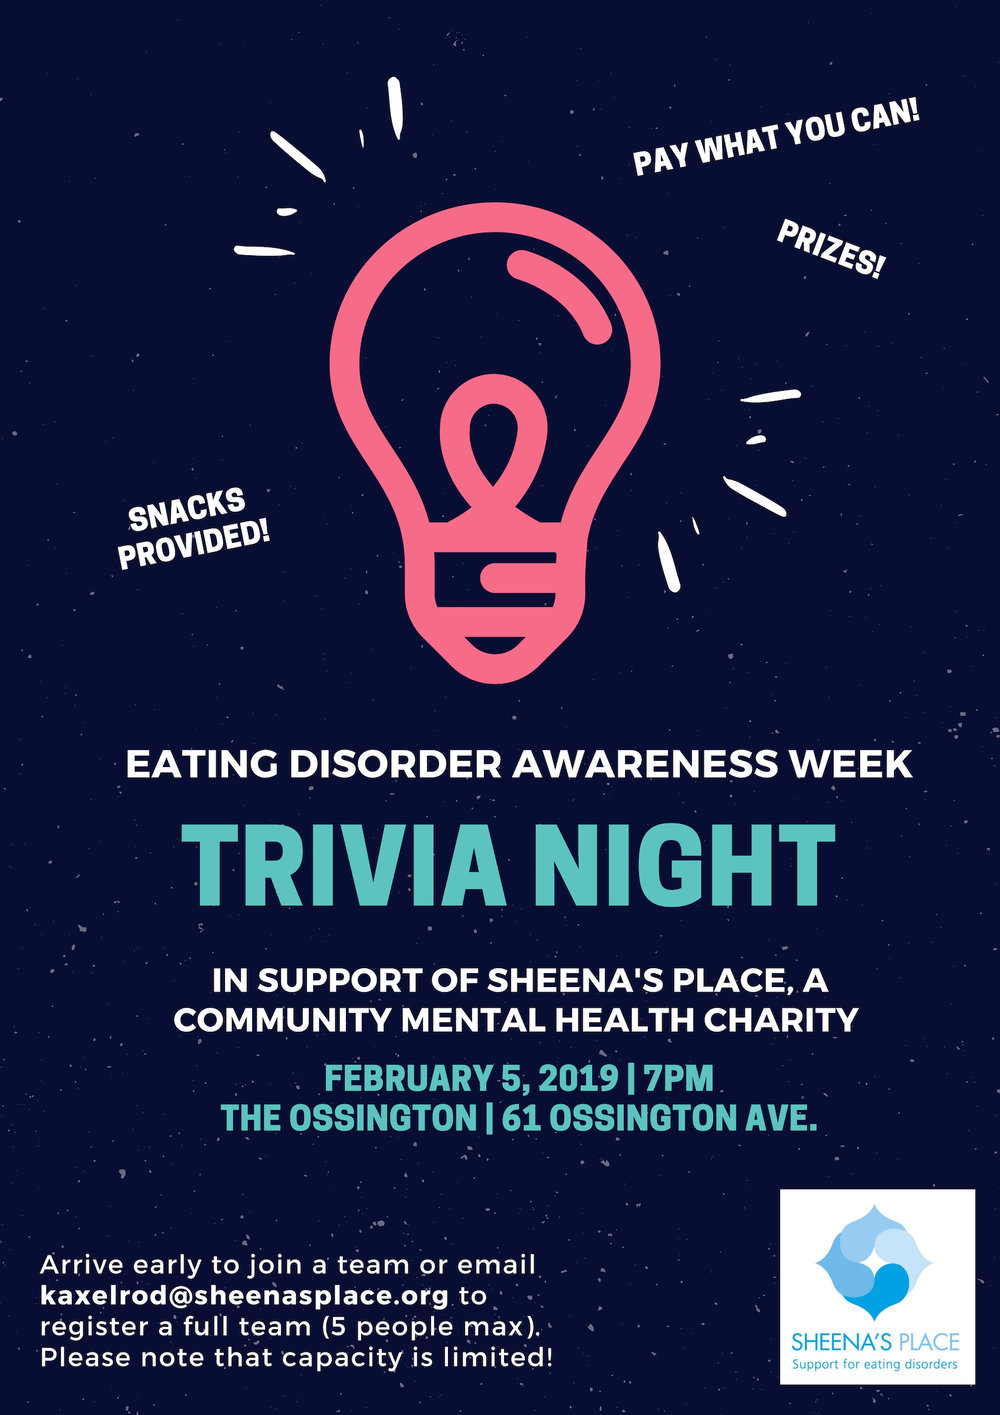 EDAW 2019 Trivia Night Poster.jpg